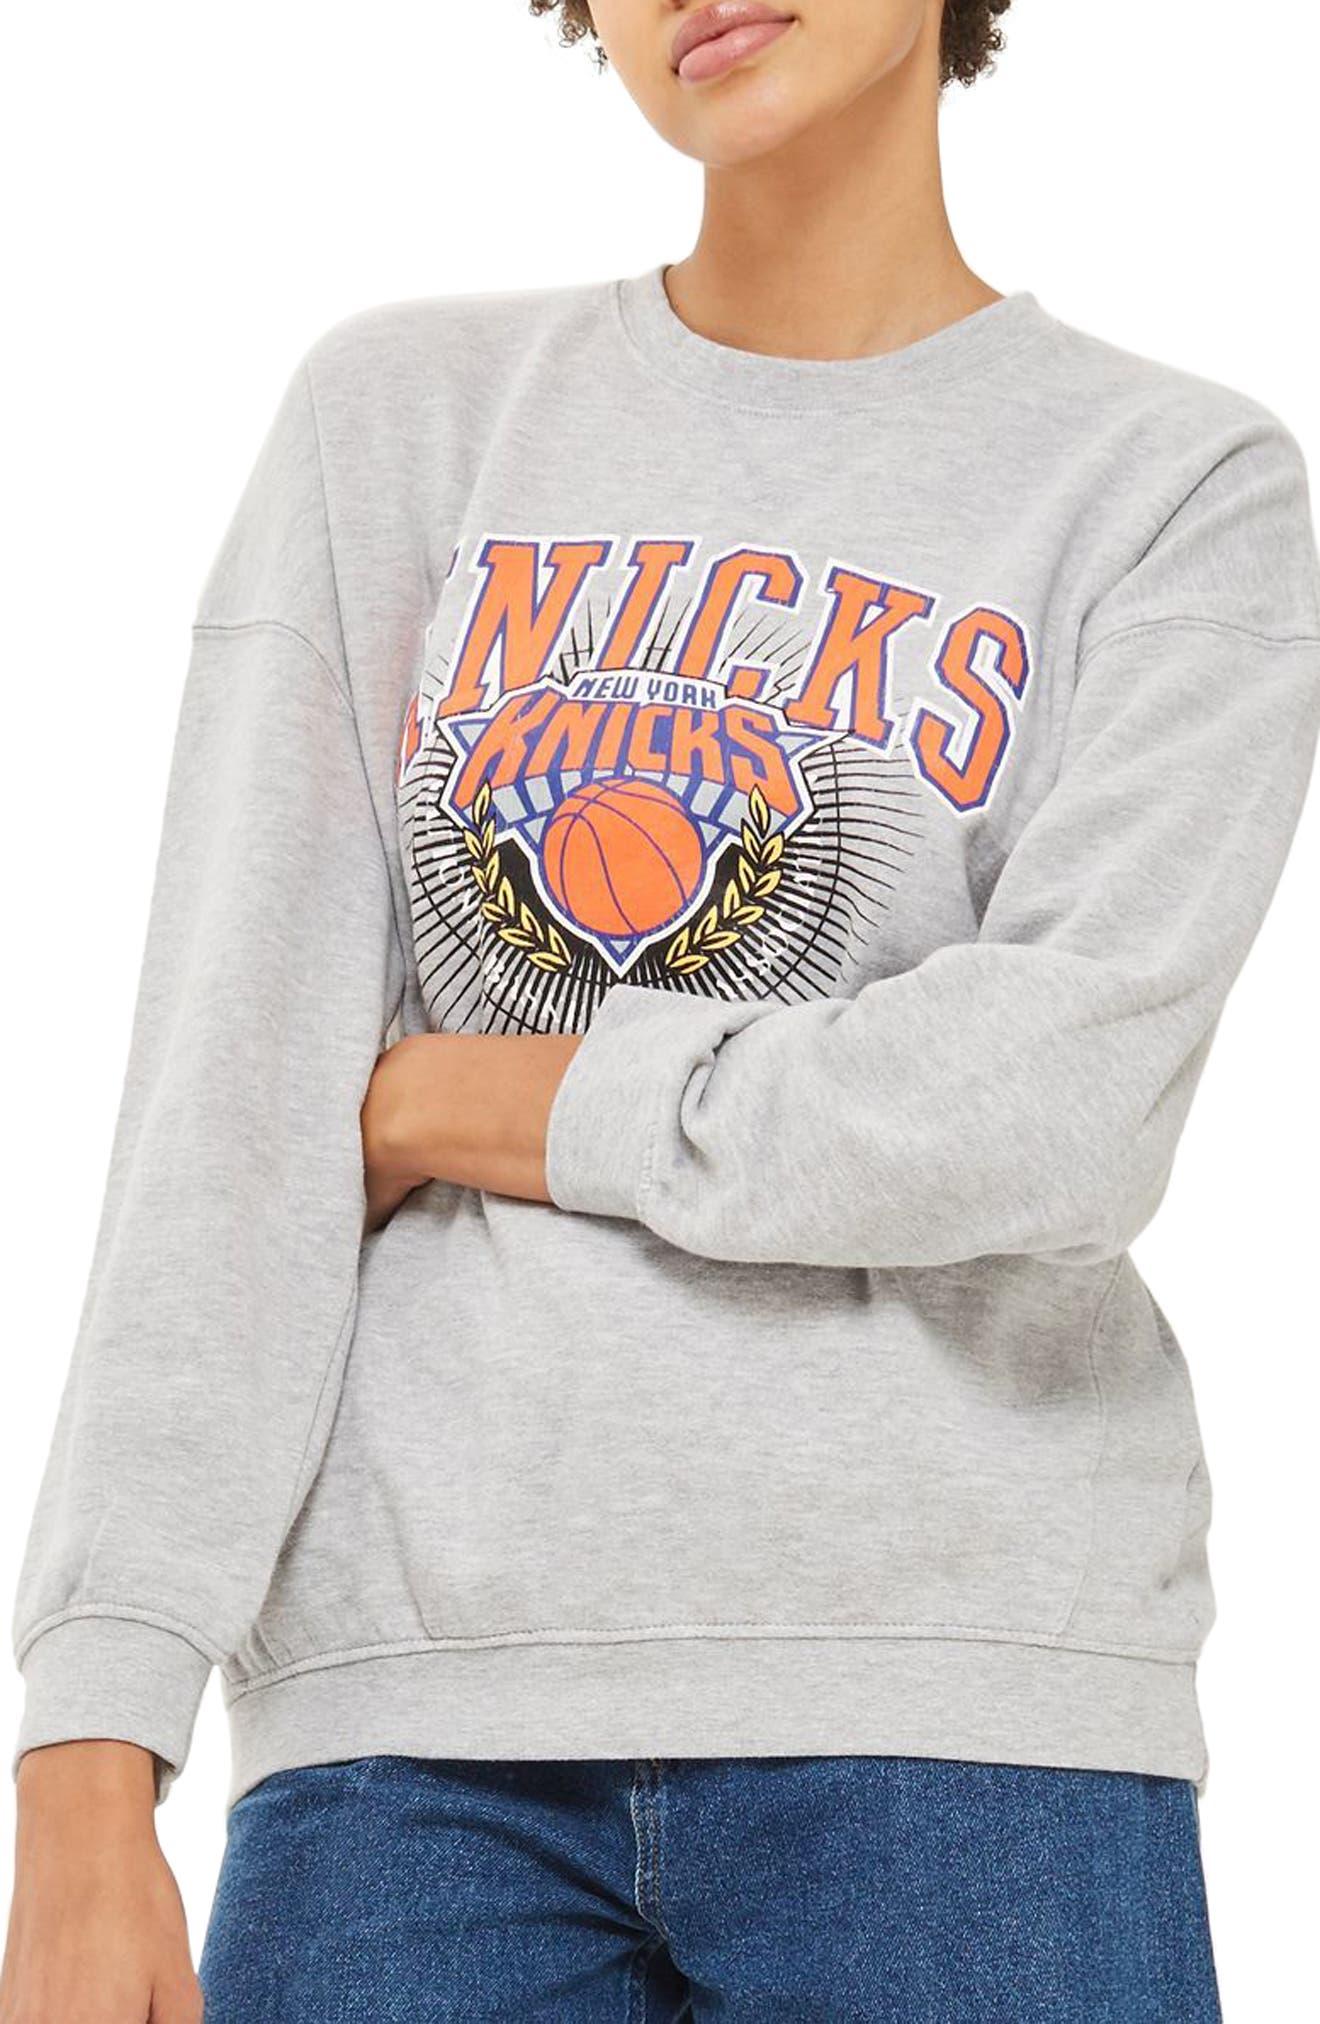 Topshop x UNK Knicks Sweatshirt